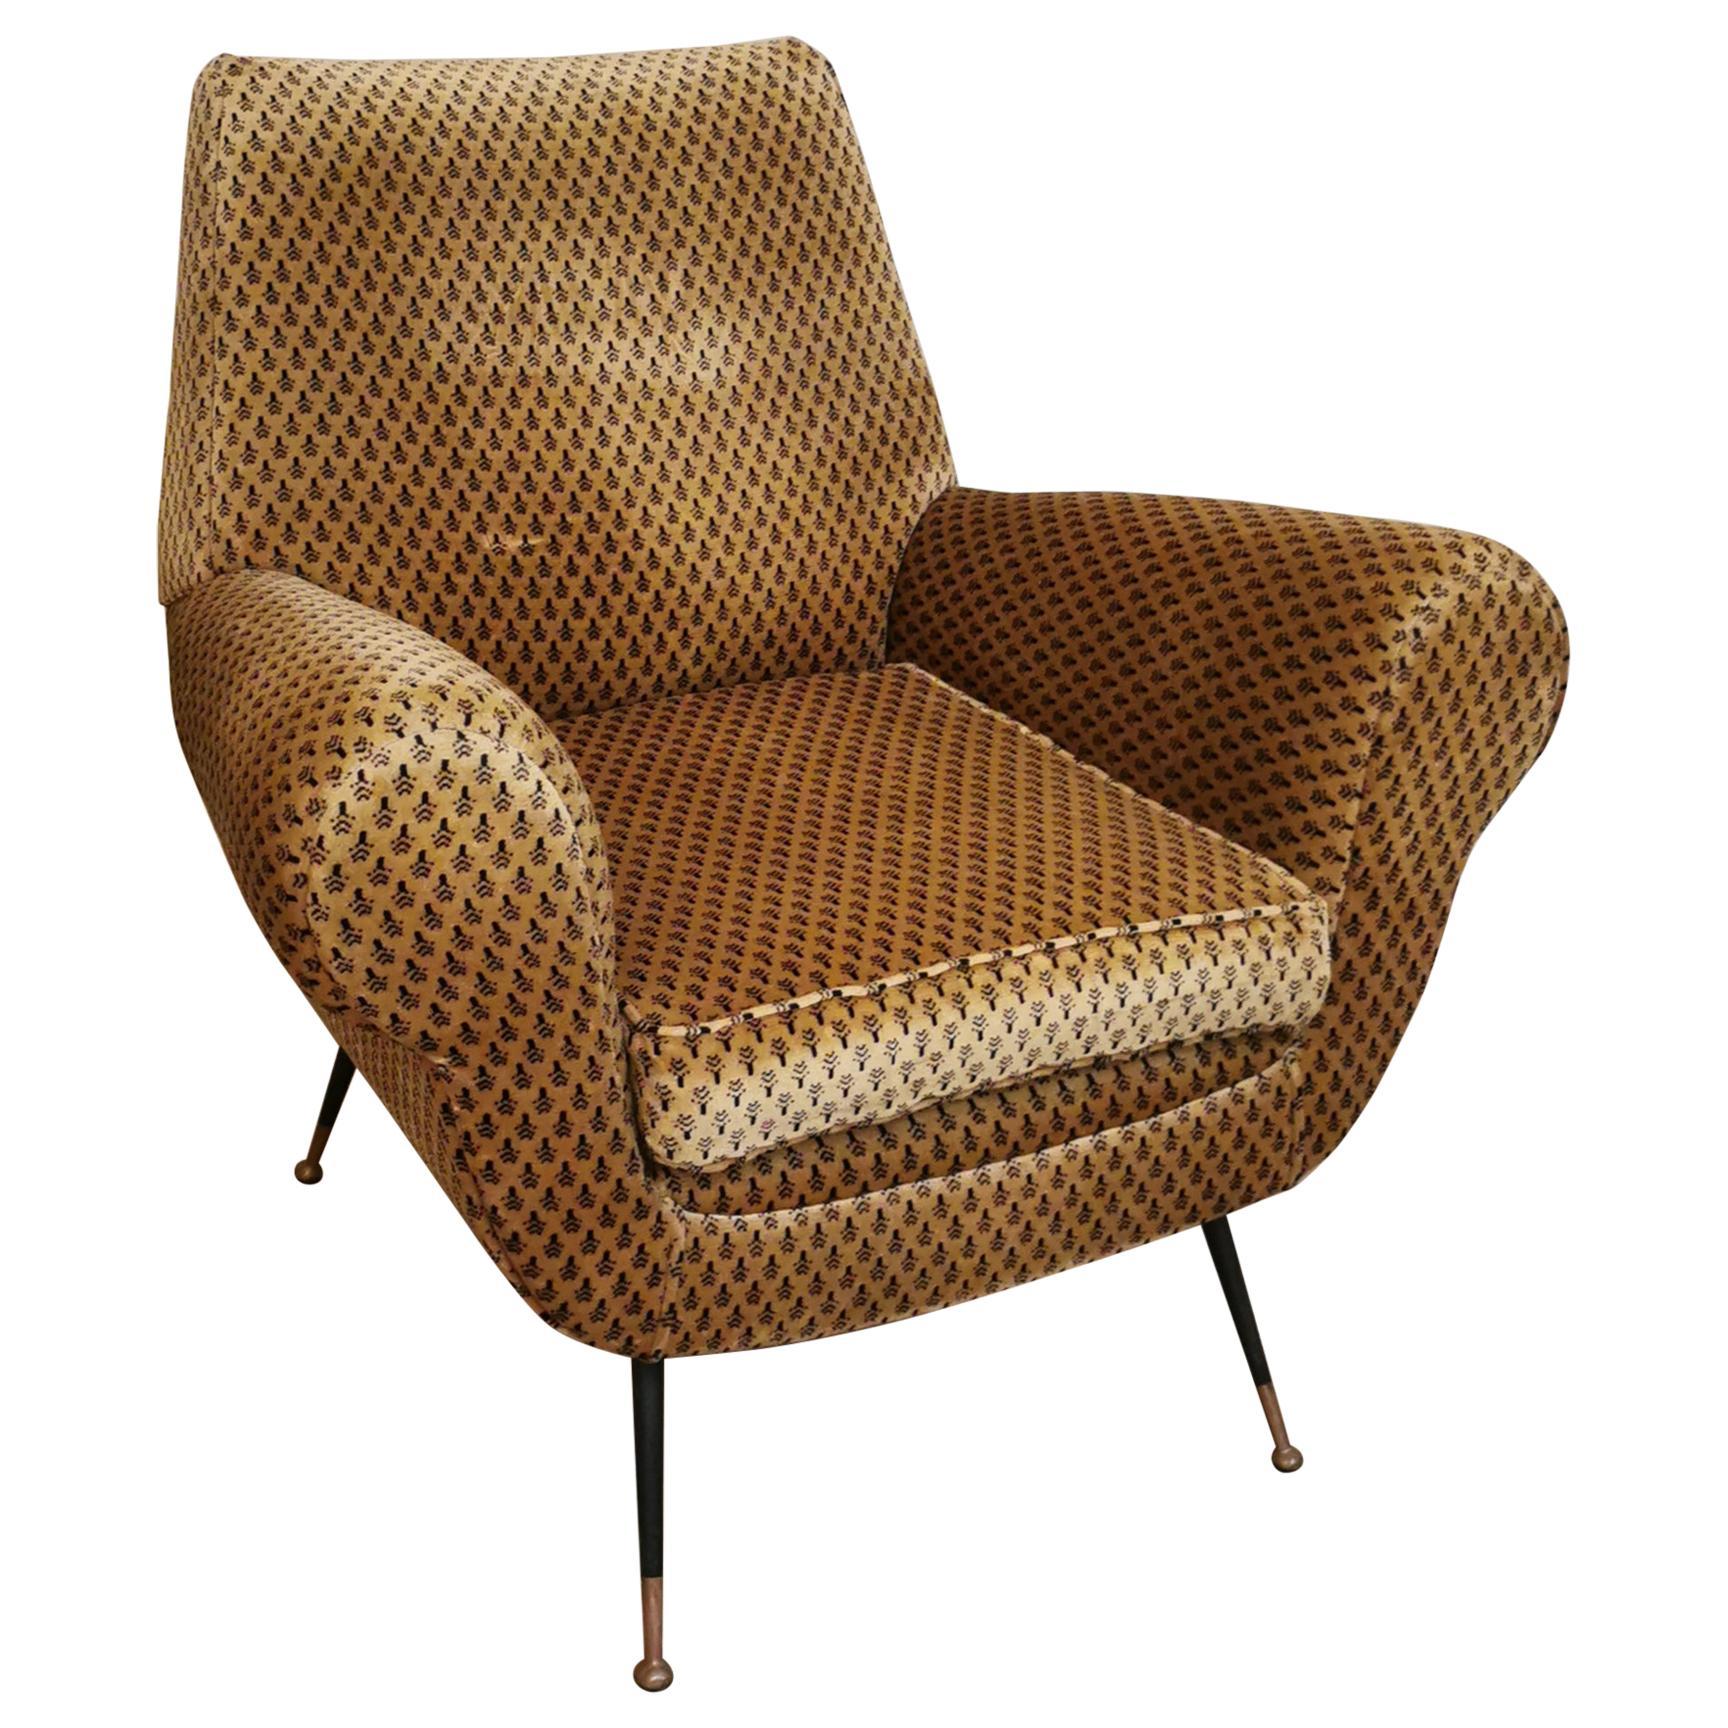 Mid Century Armchair by Gigi Radice Velvet Brown Black Brass, Italy, 1950s